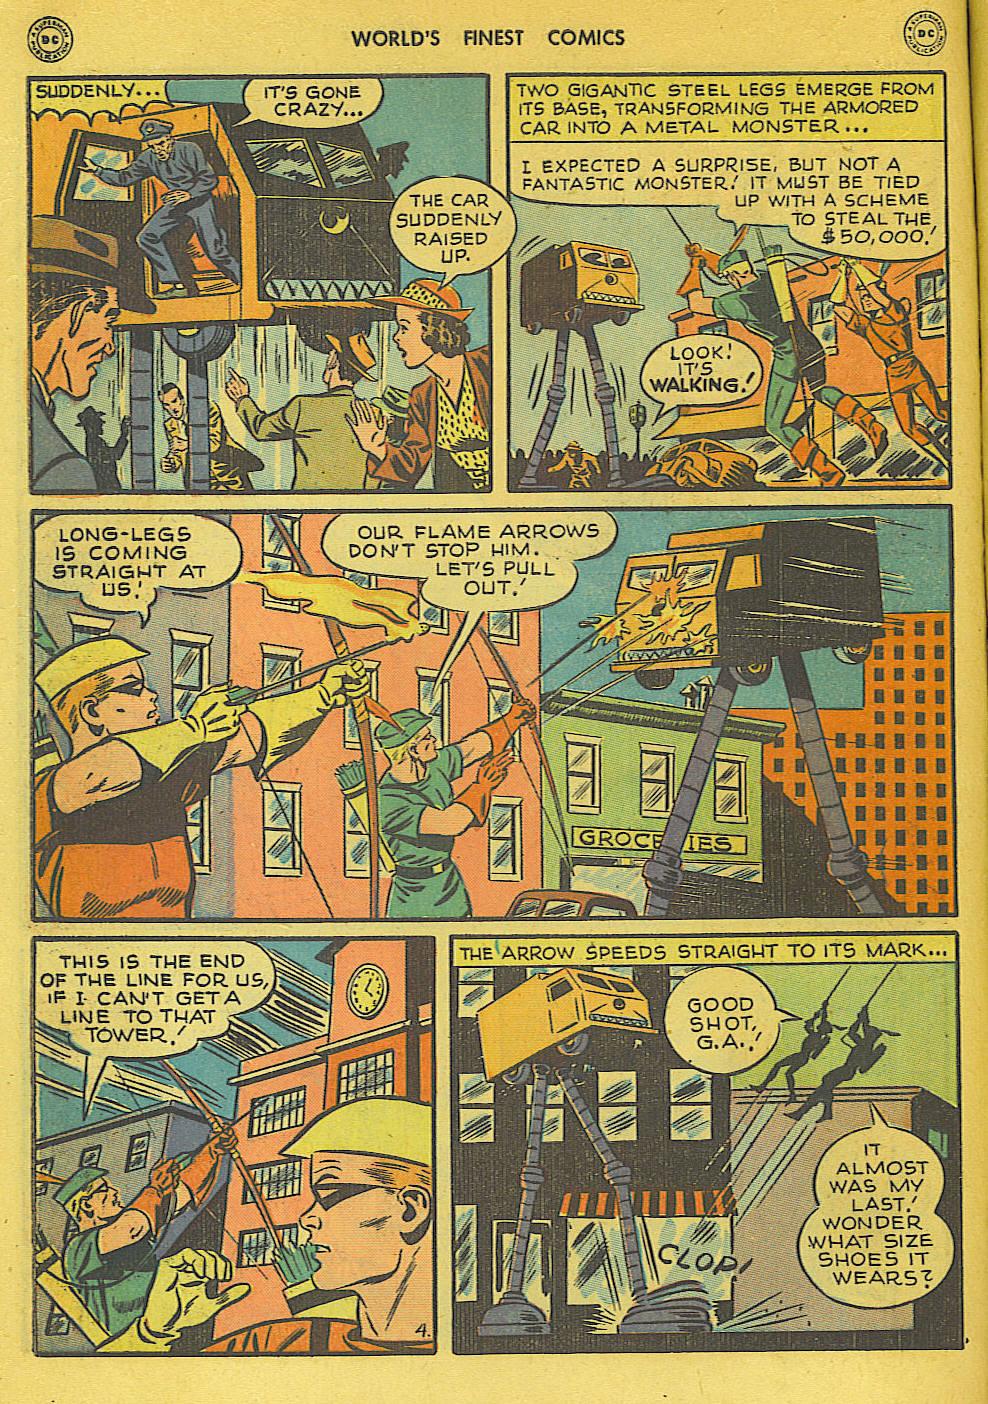 Read online World's Finest Comics comic -  Issue #34 - 44